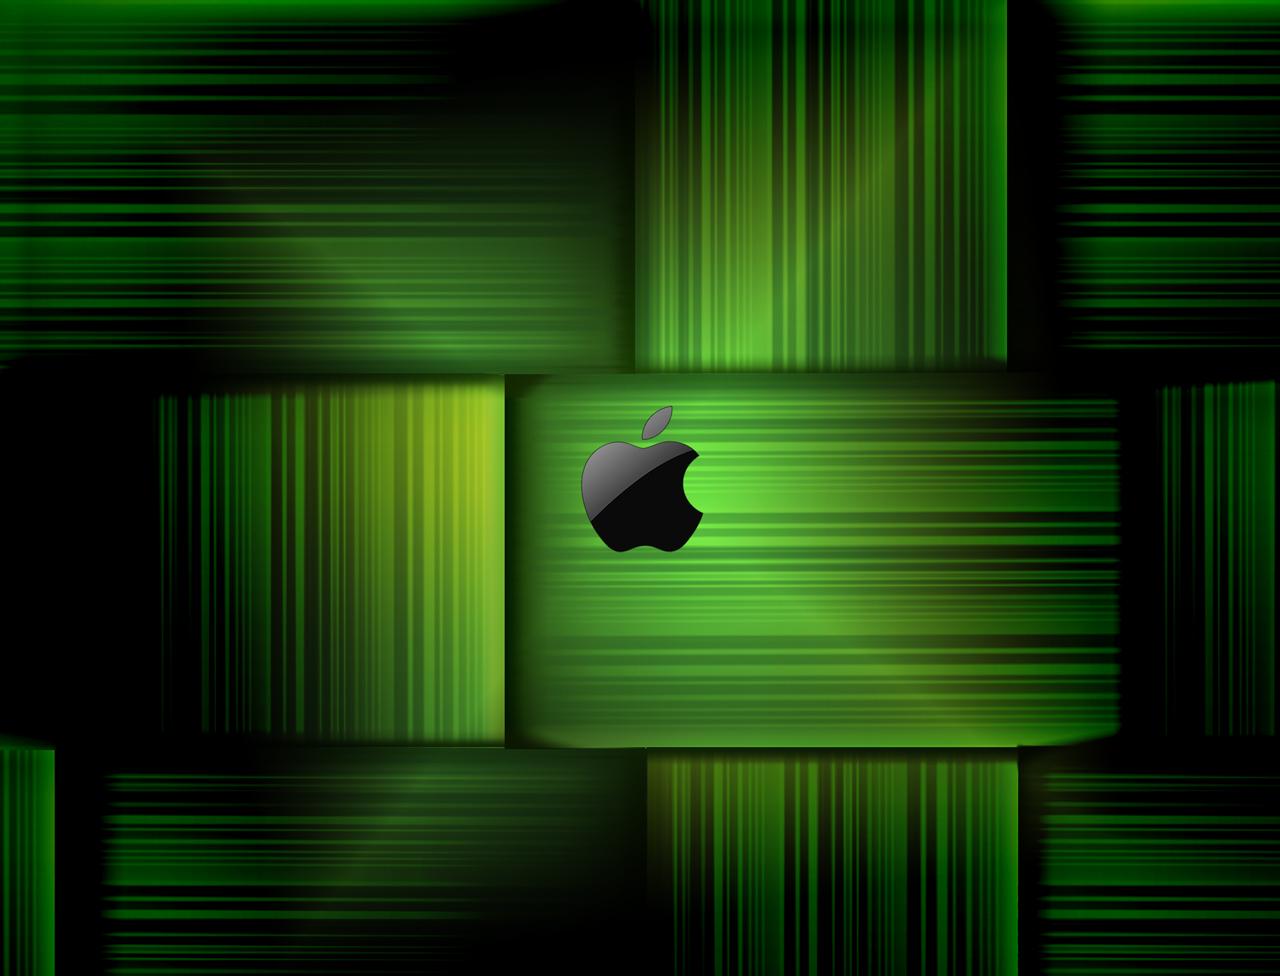 apple wallpaper desktop black apple wallpaper apple mac wallpaper 1280x976